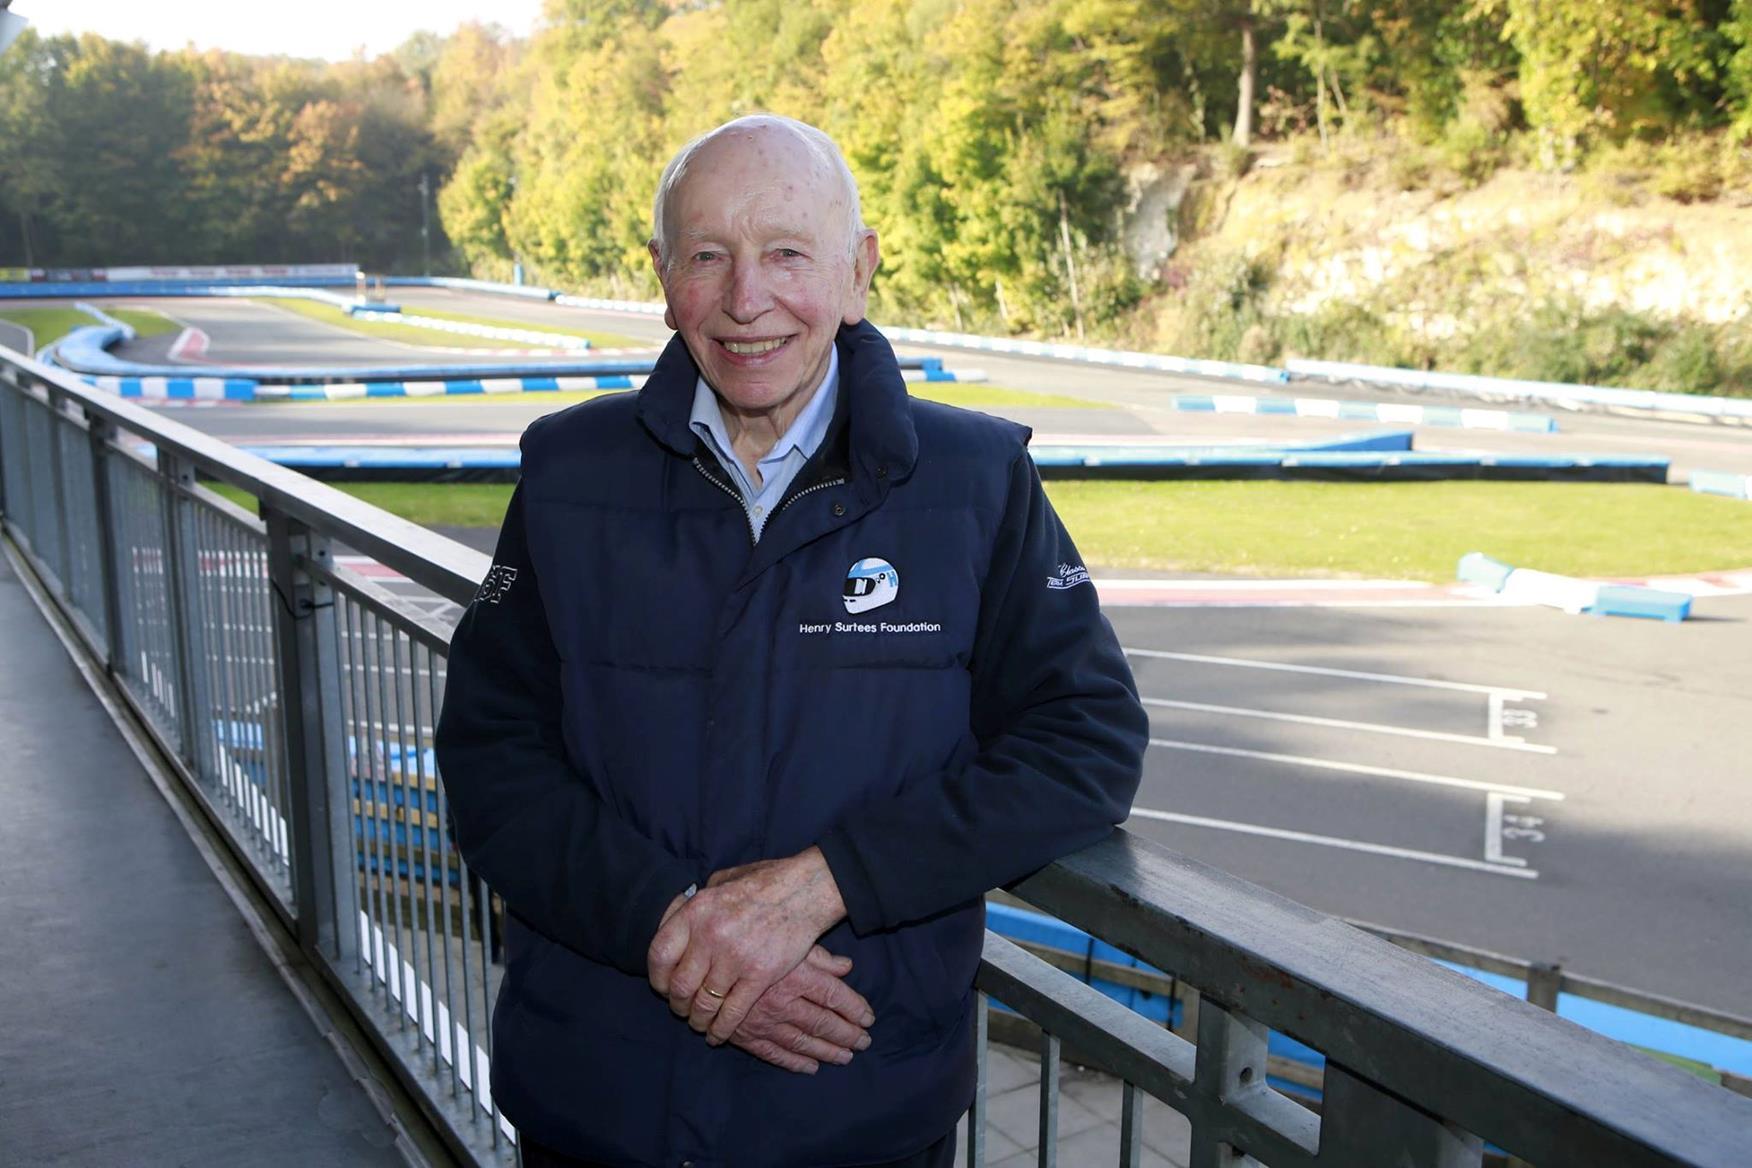 doctor john hinds has died mcn grand prix and f1 winner john surtees dies aged 83